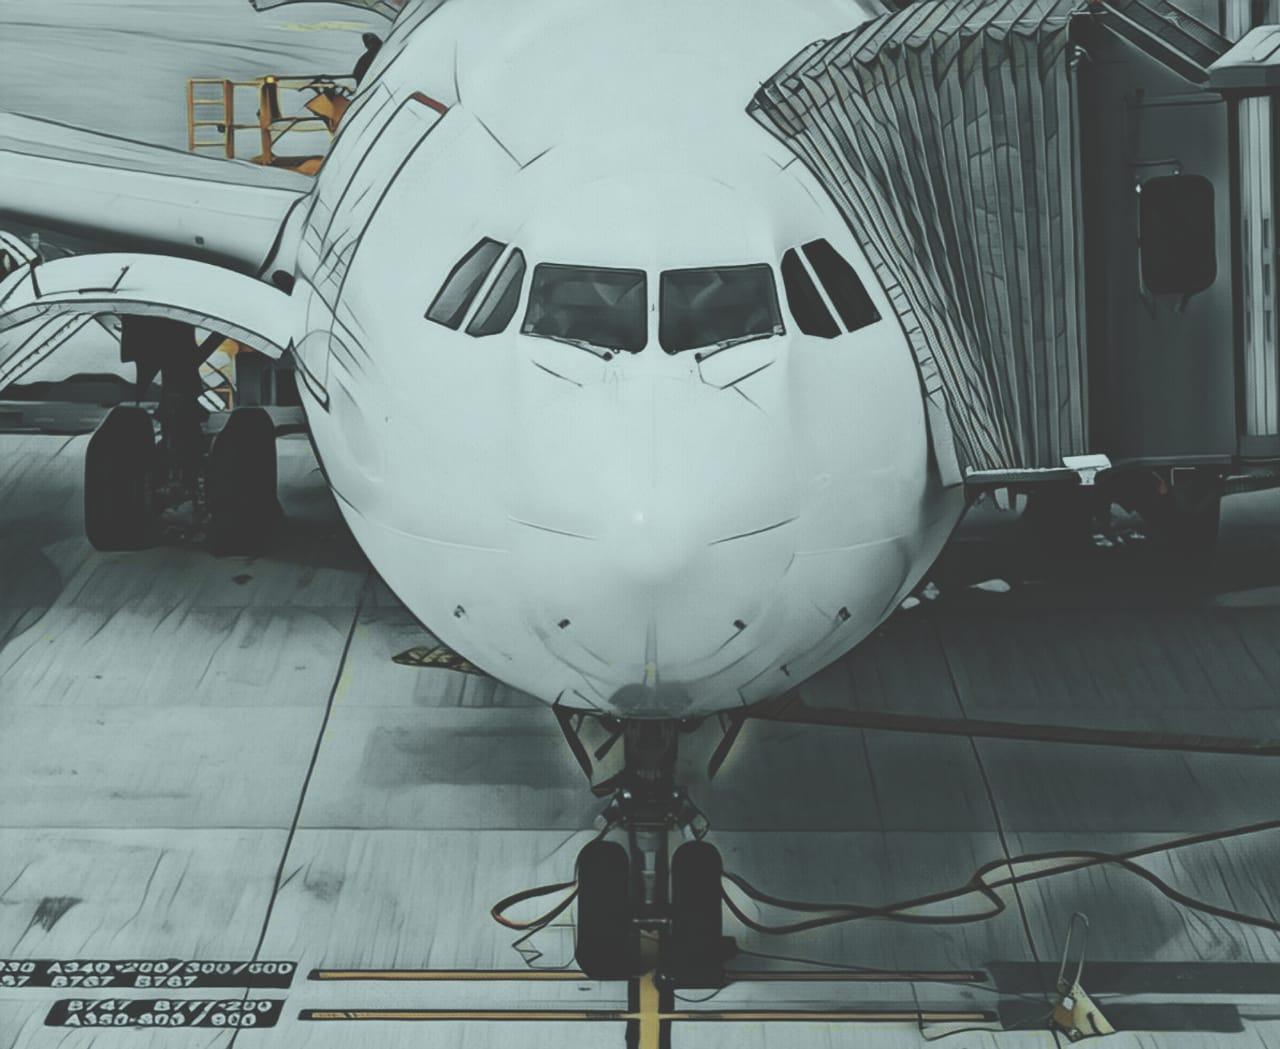 https: img-k.okeinfo.net content 2020 01 24 320 2157903 soal-virus-korona-kemenhub-wanti-wanti-maskapai-penerbangan-vjWG2HuZJG.jpeg